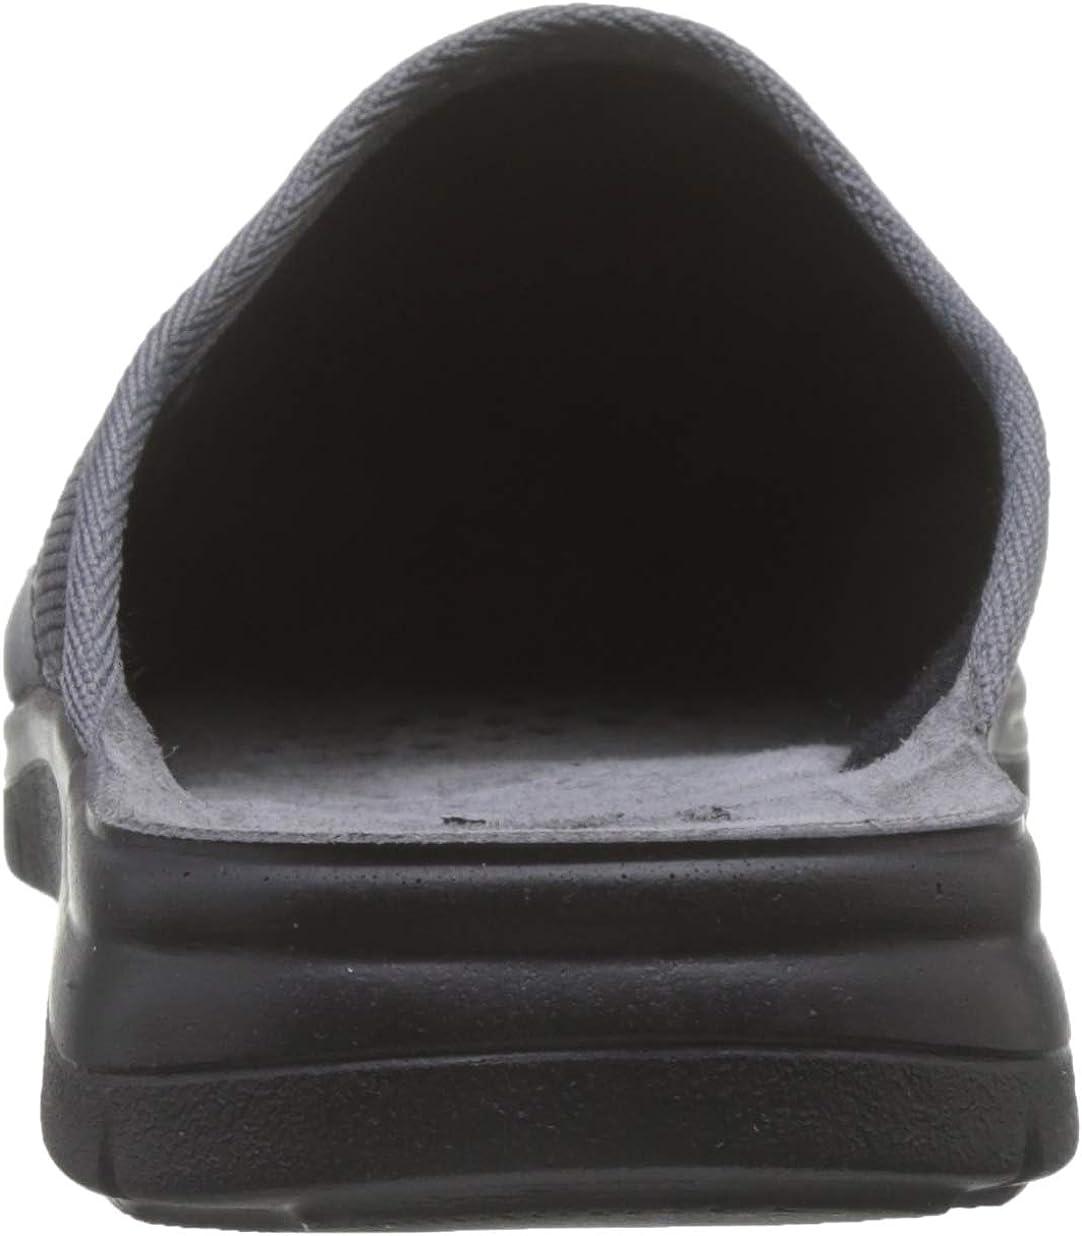 inblu Big Jim Pantofole Aperte sul Retro Uomo